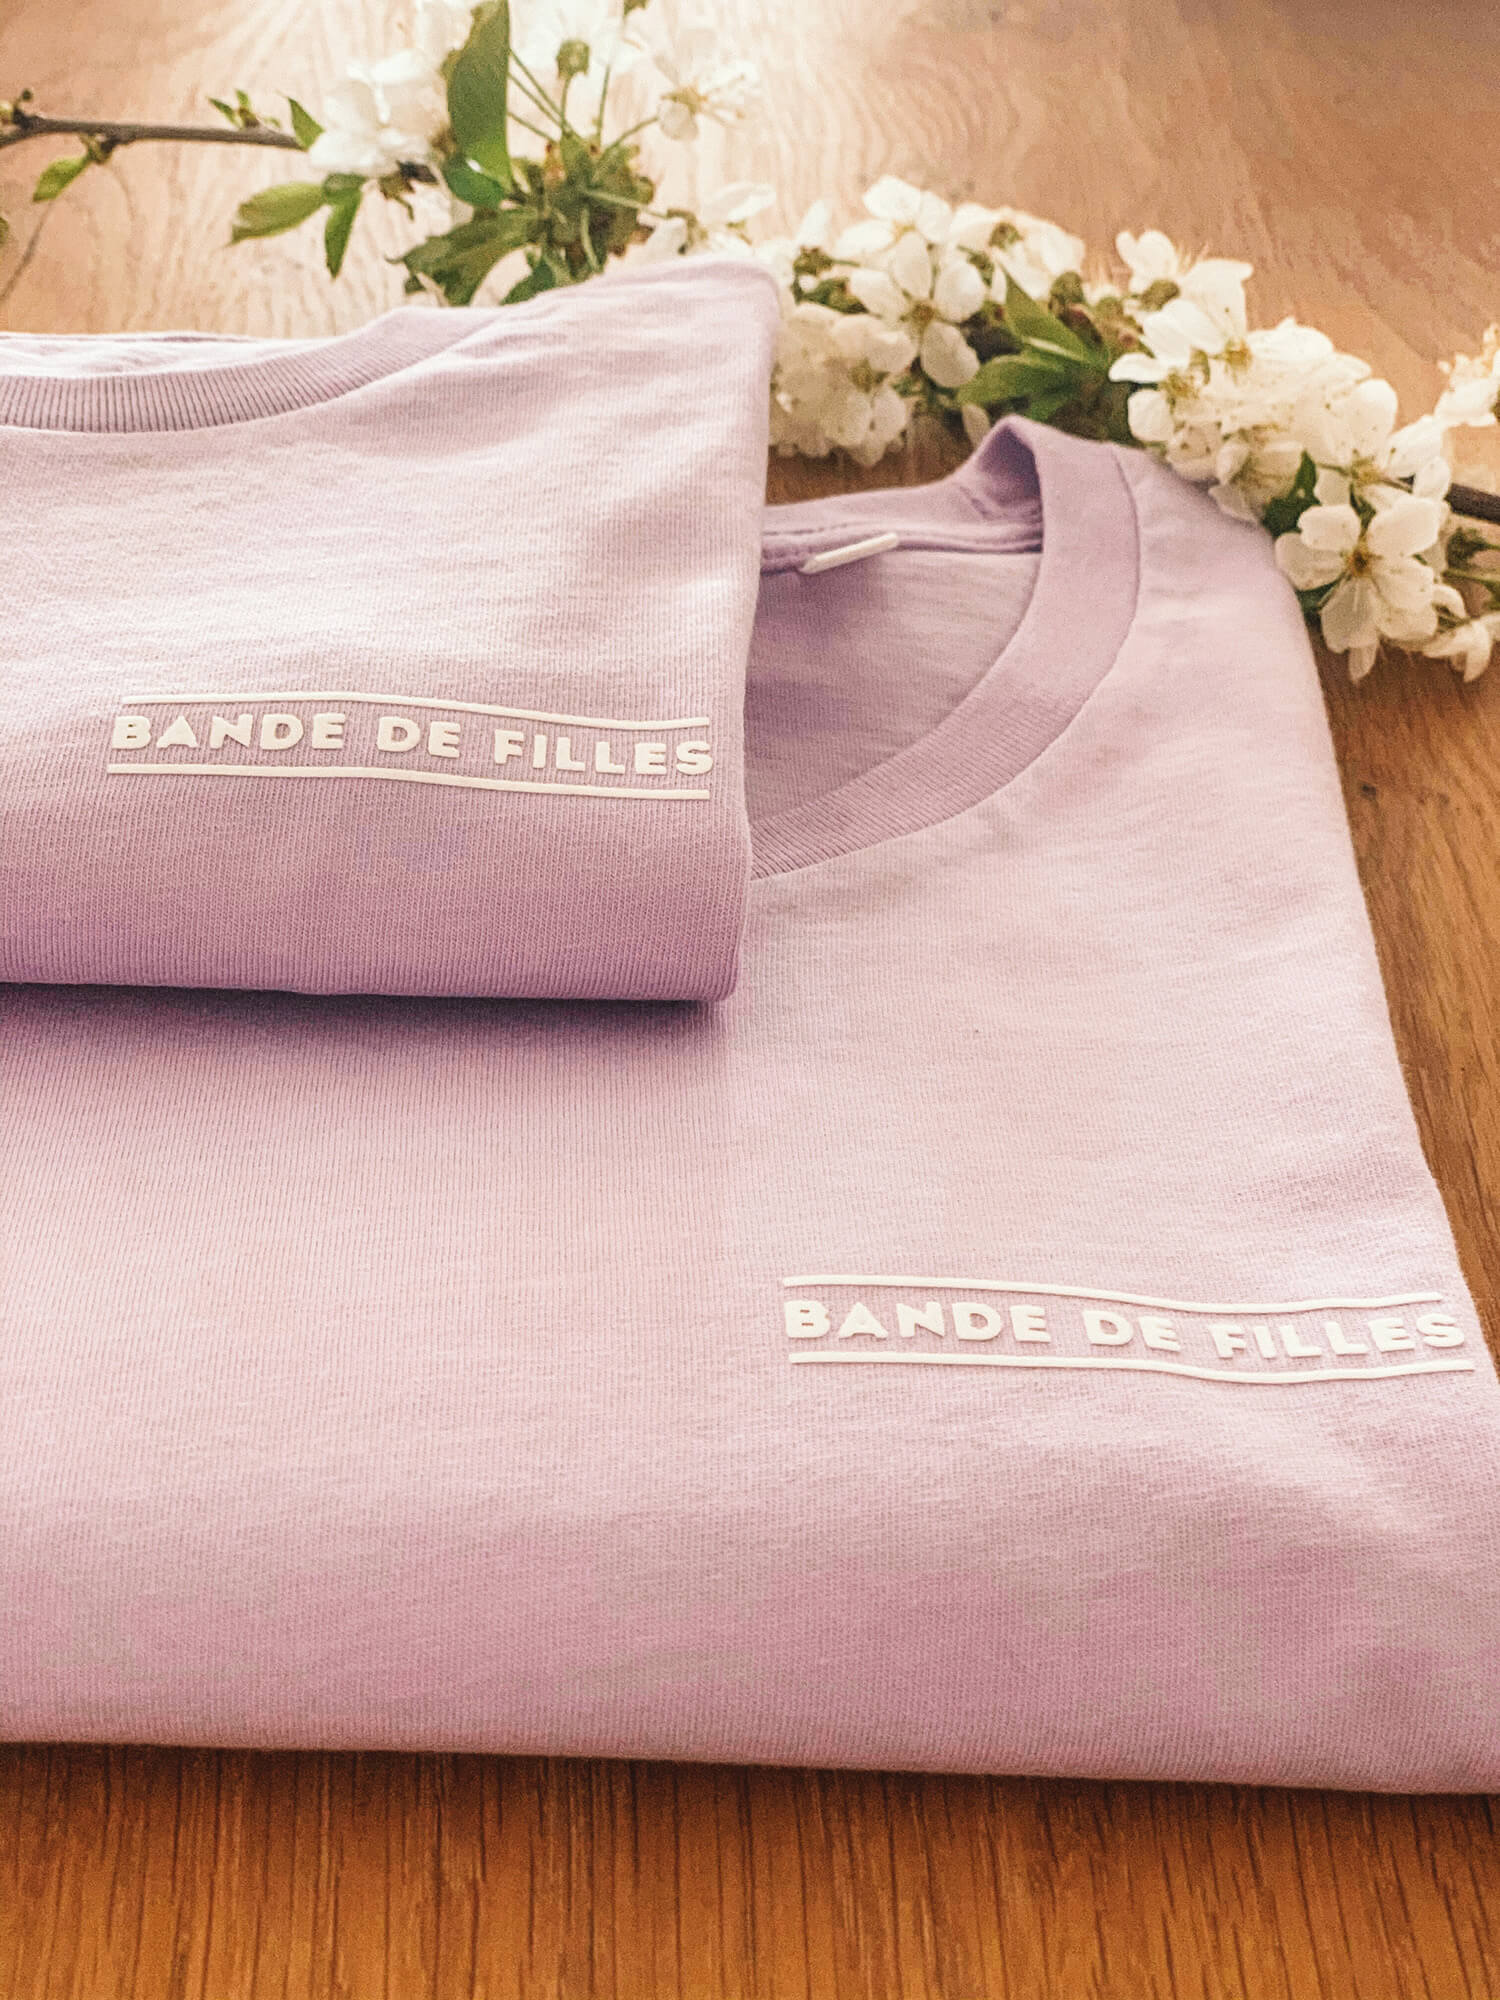 Bande de filles - twinning t-shirt by Mangos on Monday